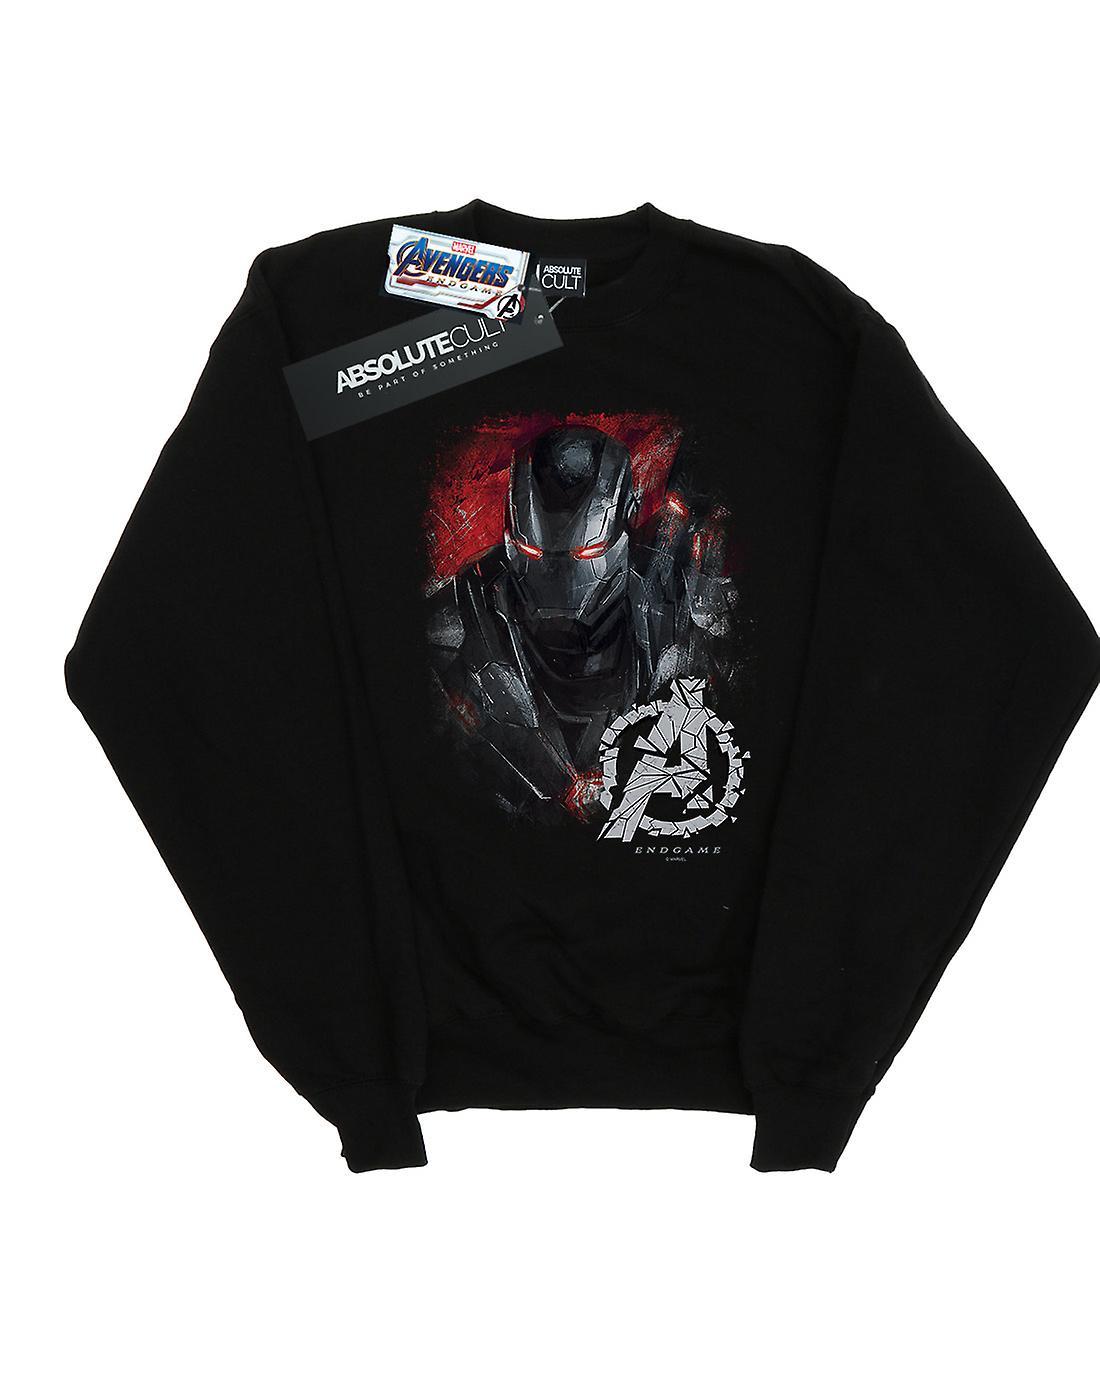 Marvel Avengers ragazzi Endgame macchina da guerra spazzolato Sweatshirt